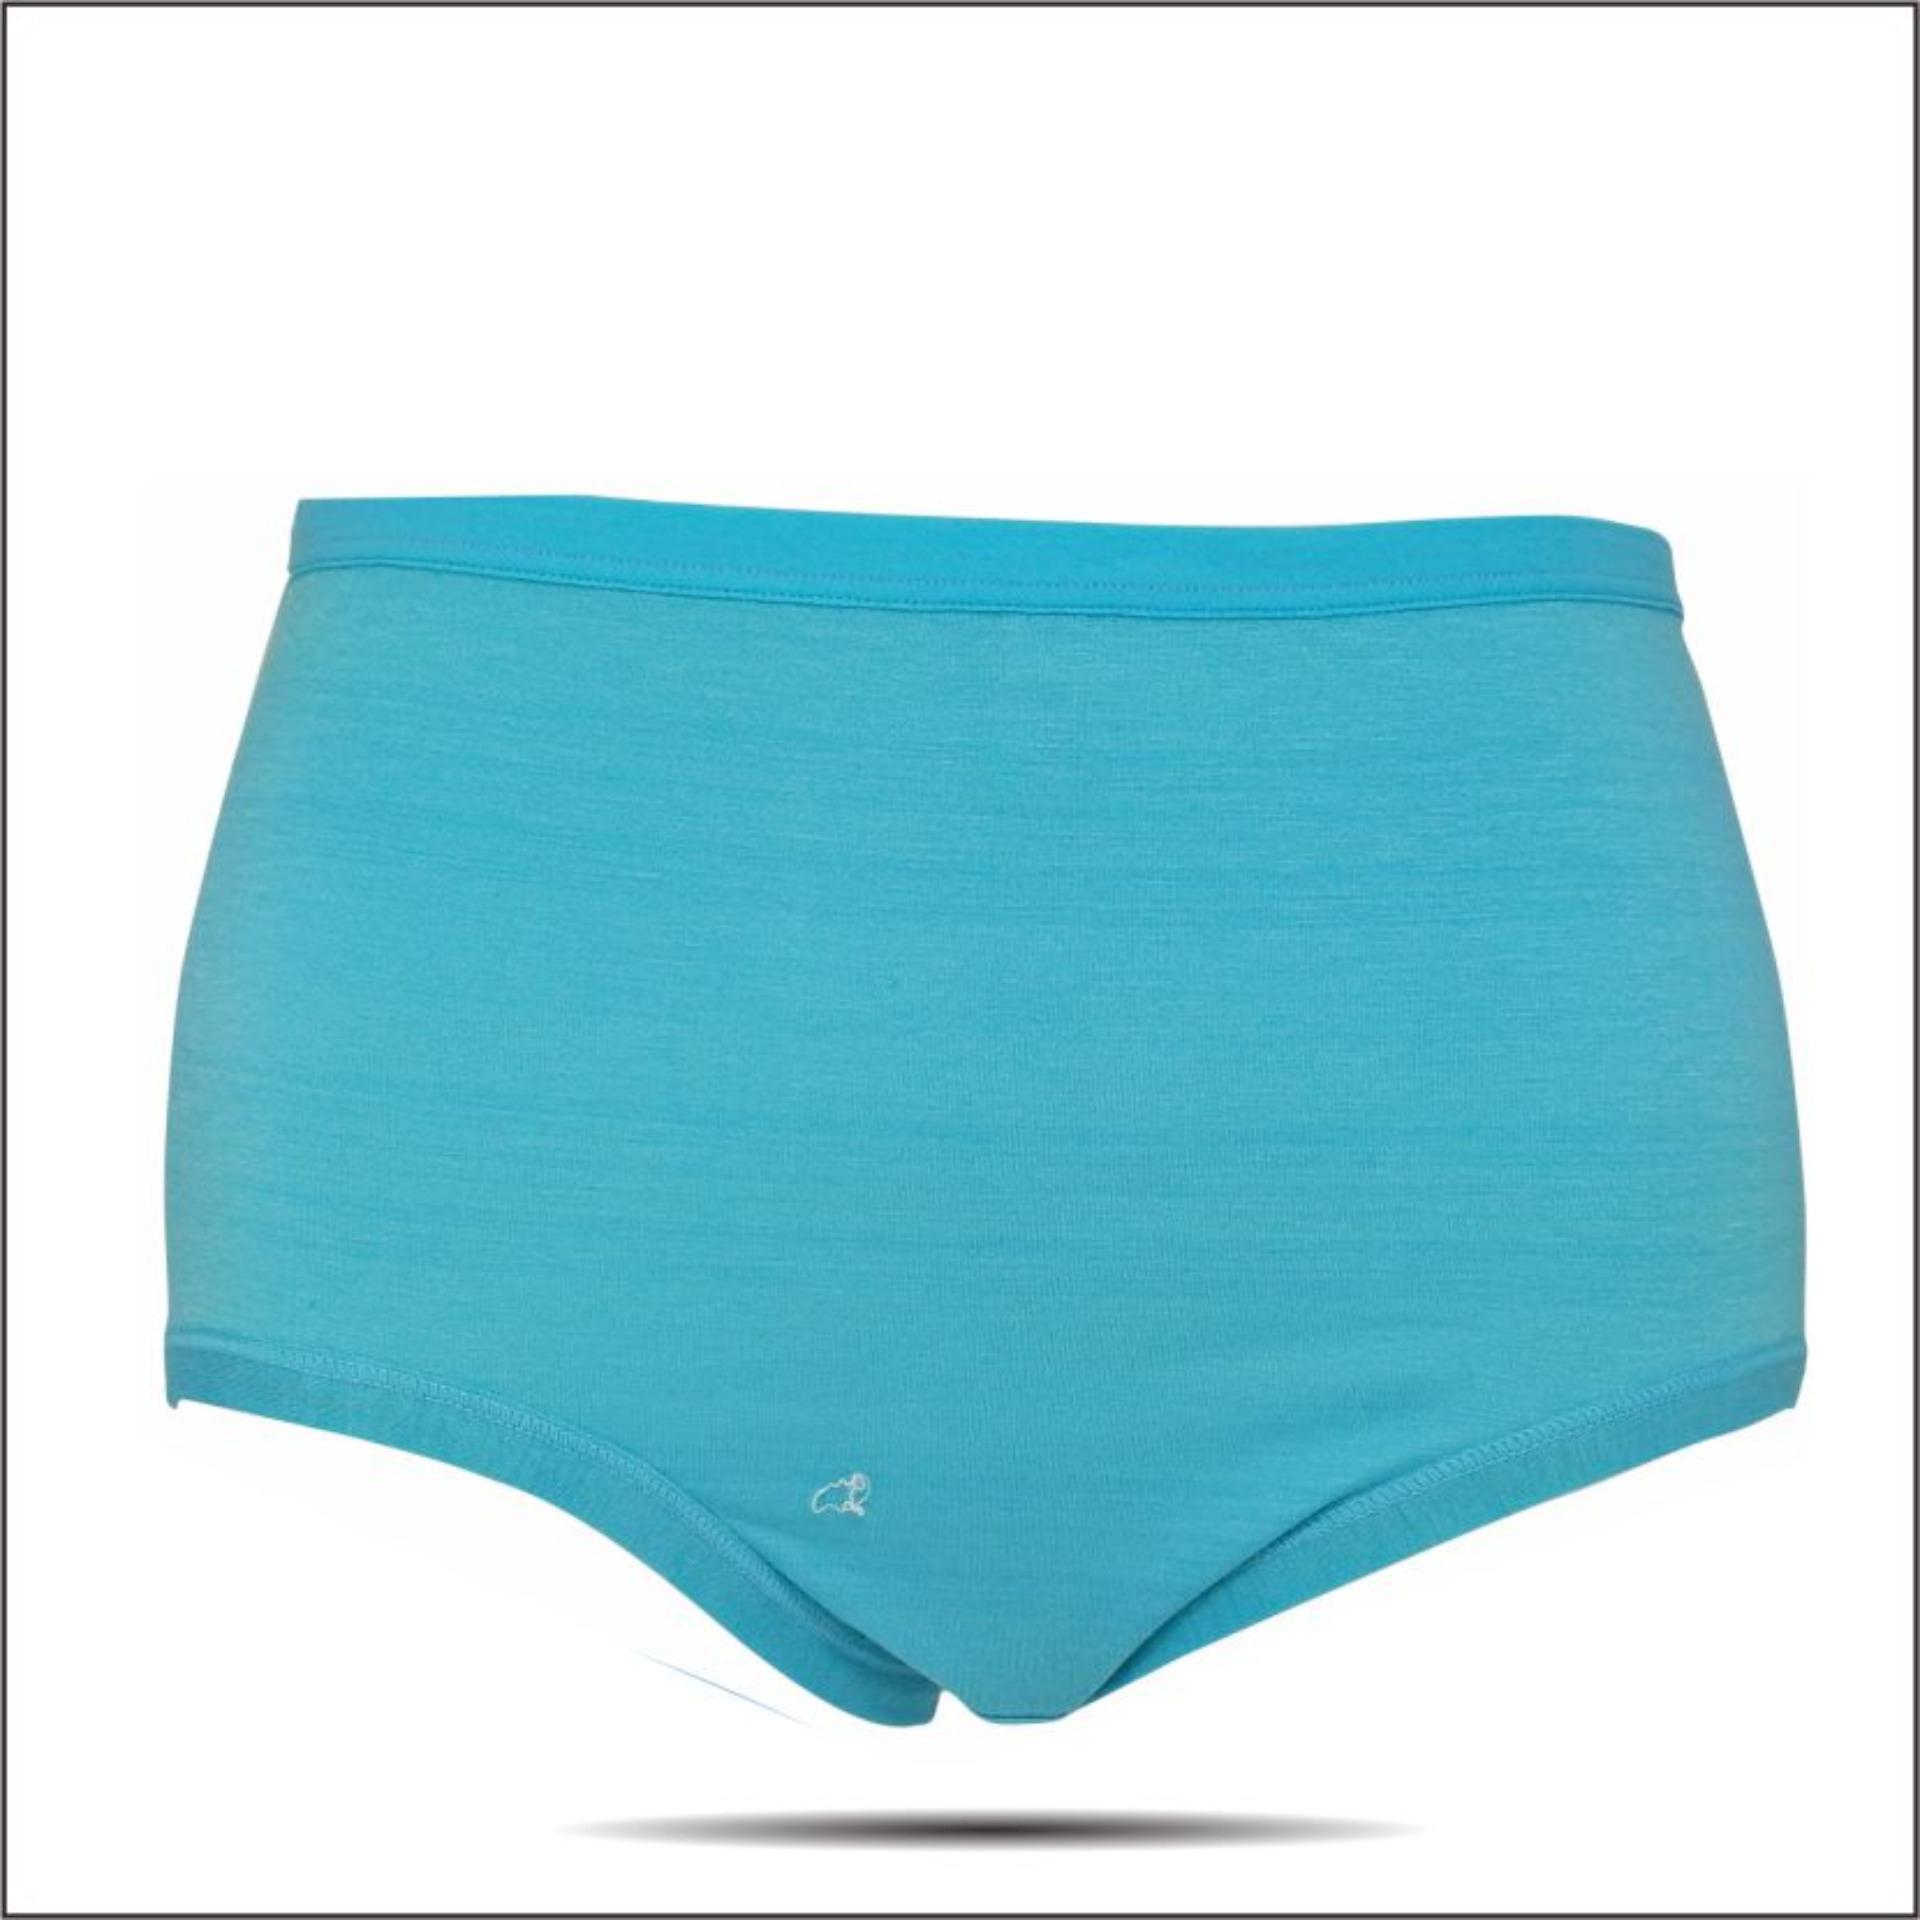 Eelic Cdw 20336 3pcs Biru Muda Ungu Merah Celana Dalam Wanita Big Lembut 1739 Hijau Size S L Dan Sexy Source Weitech